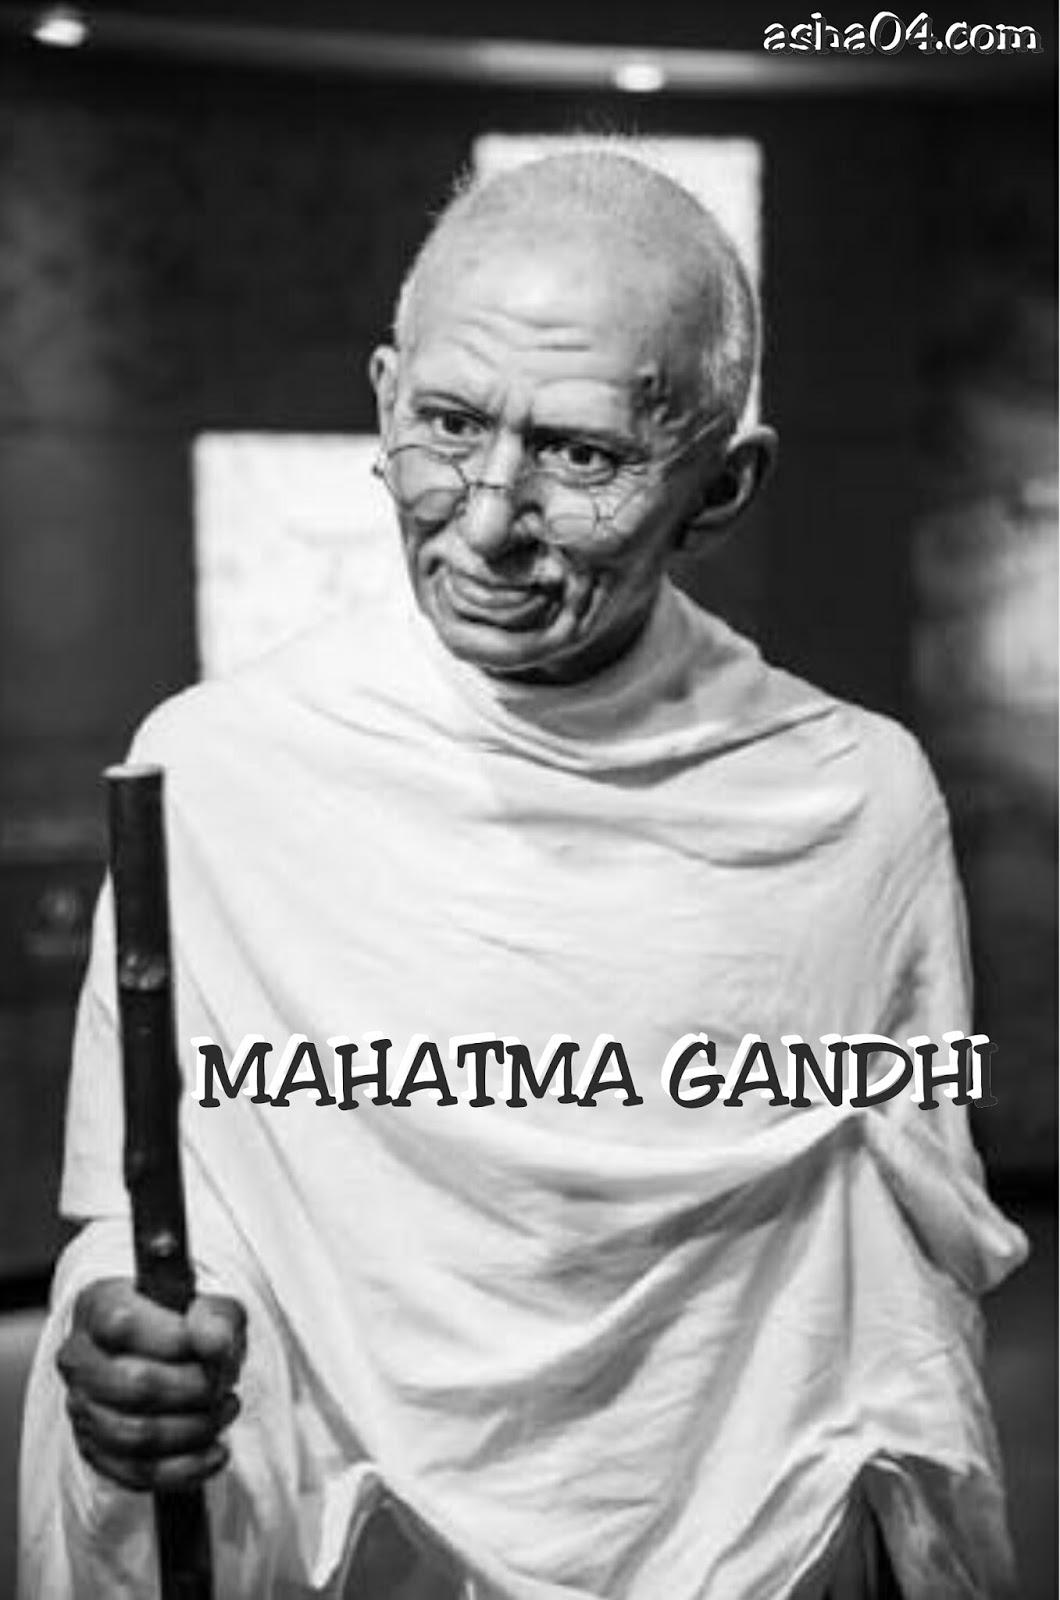 Kata Kata Bijak Mahatma Gandhi : bijak, mahatma, gandhi, Kumpulan, Kata-kata, Bijak, MAHATMA, GANDHI, Dapat, Memotivasi, Membangun, ASHA04.COM